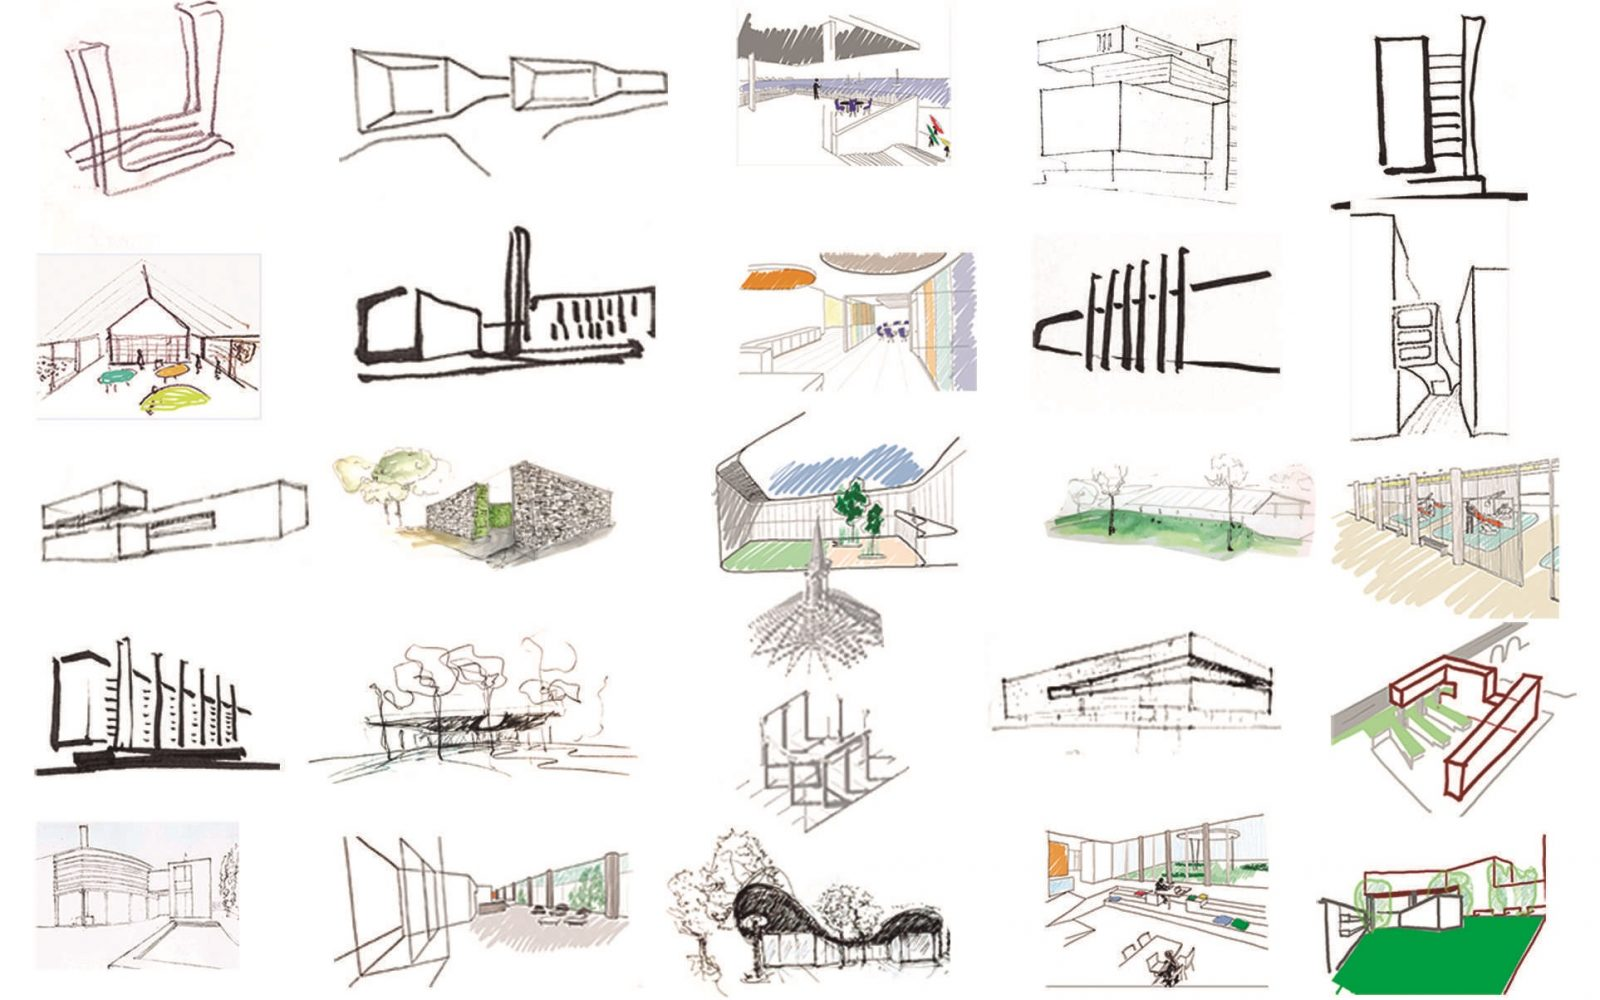 arango-arquitectos-portada2